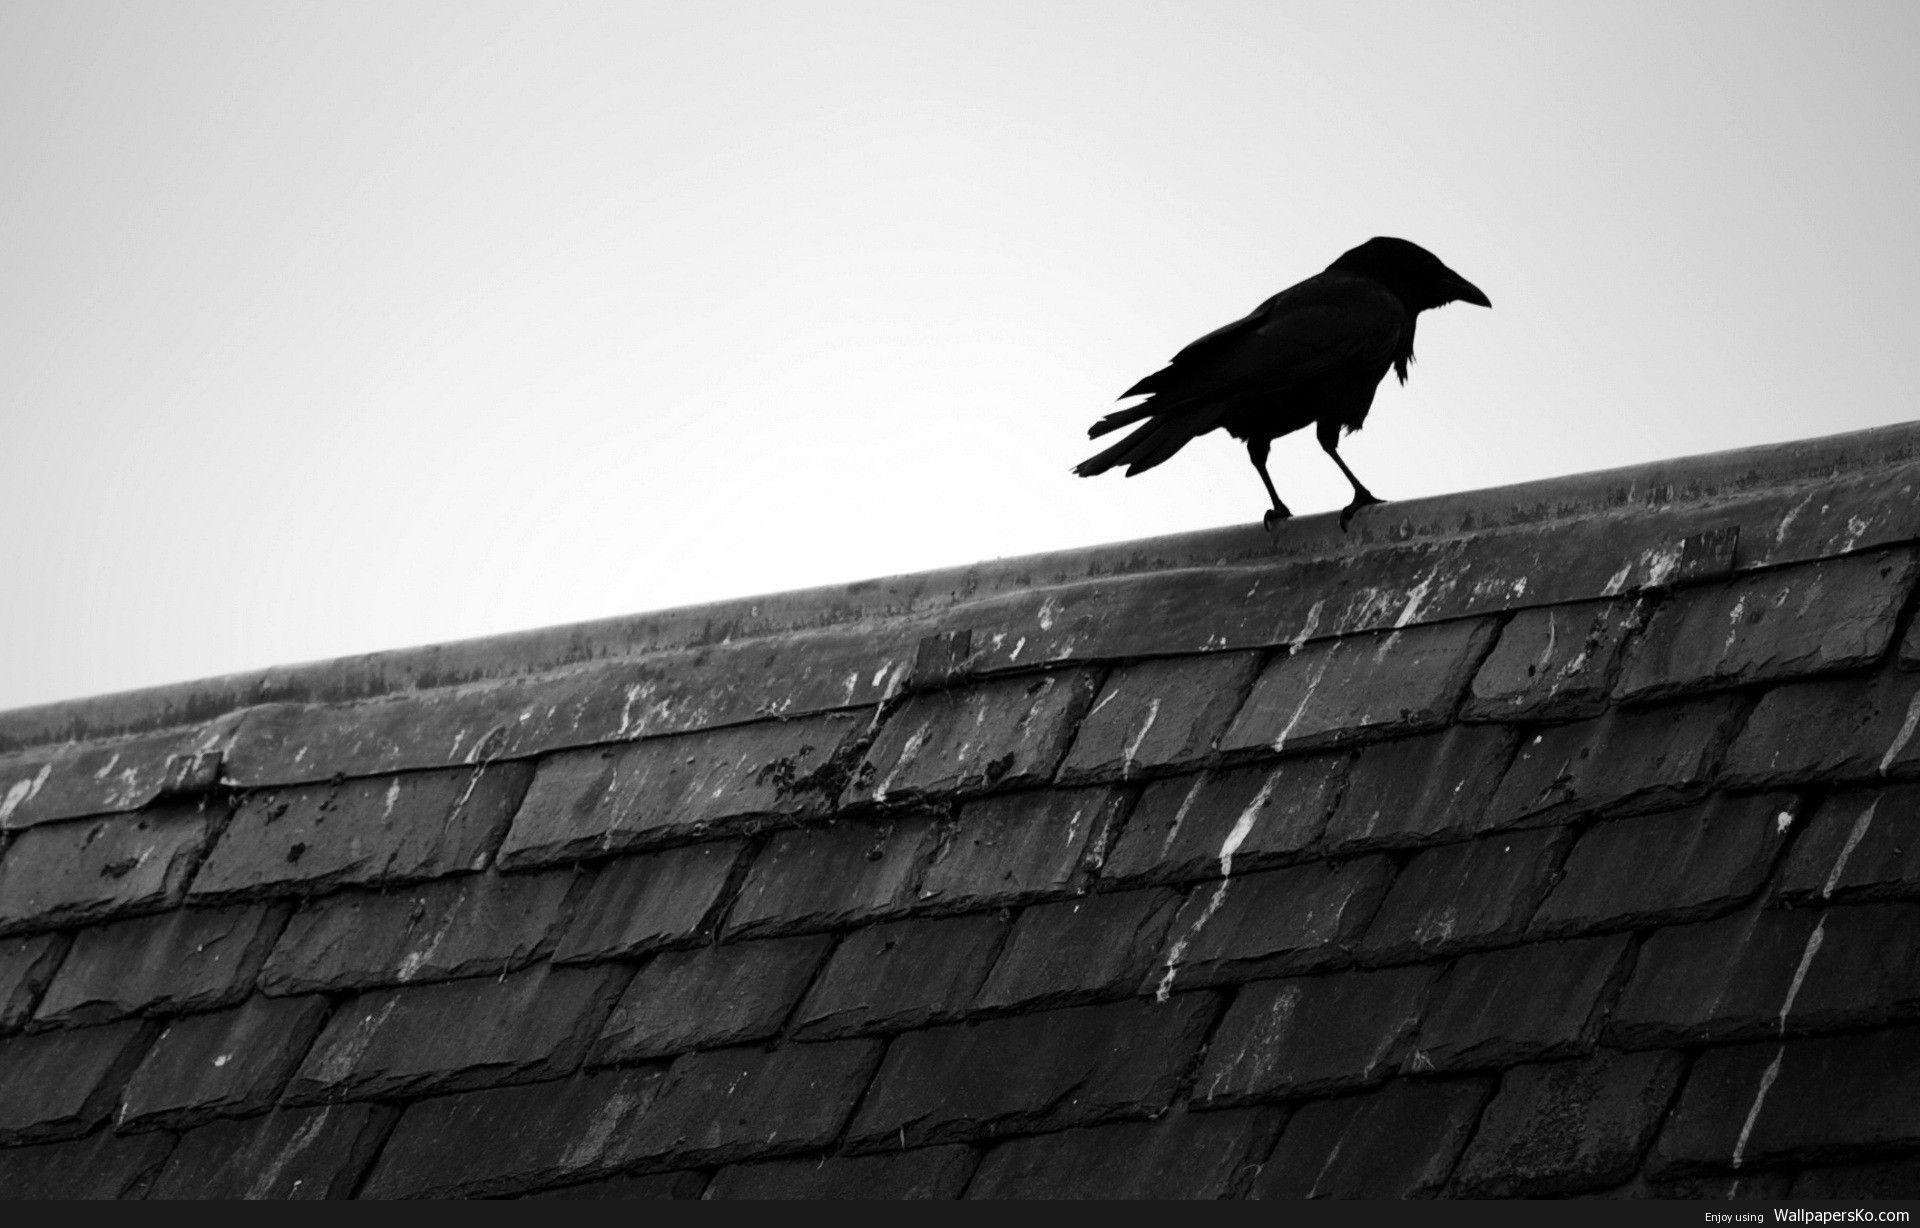 Raven Hd Wallpaper Http Wallpapersko Com Raven Hd Wallpaper Html Hd Wallpapers Download Black And White Birds Black Bird Bird Wallpaper